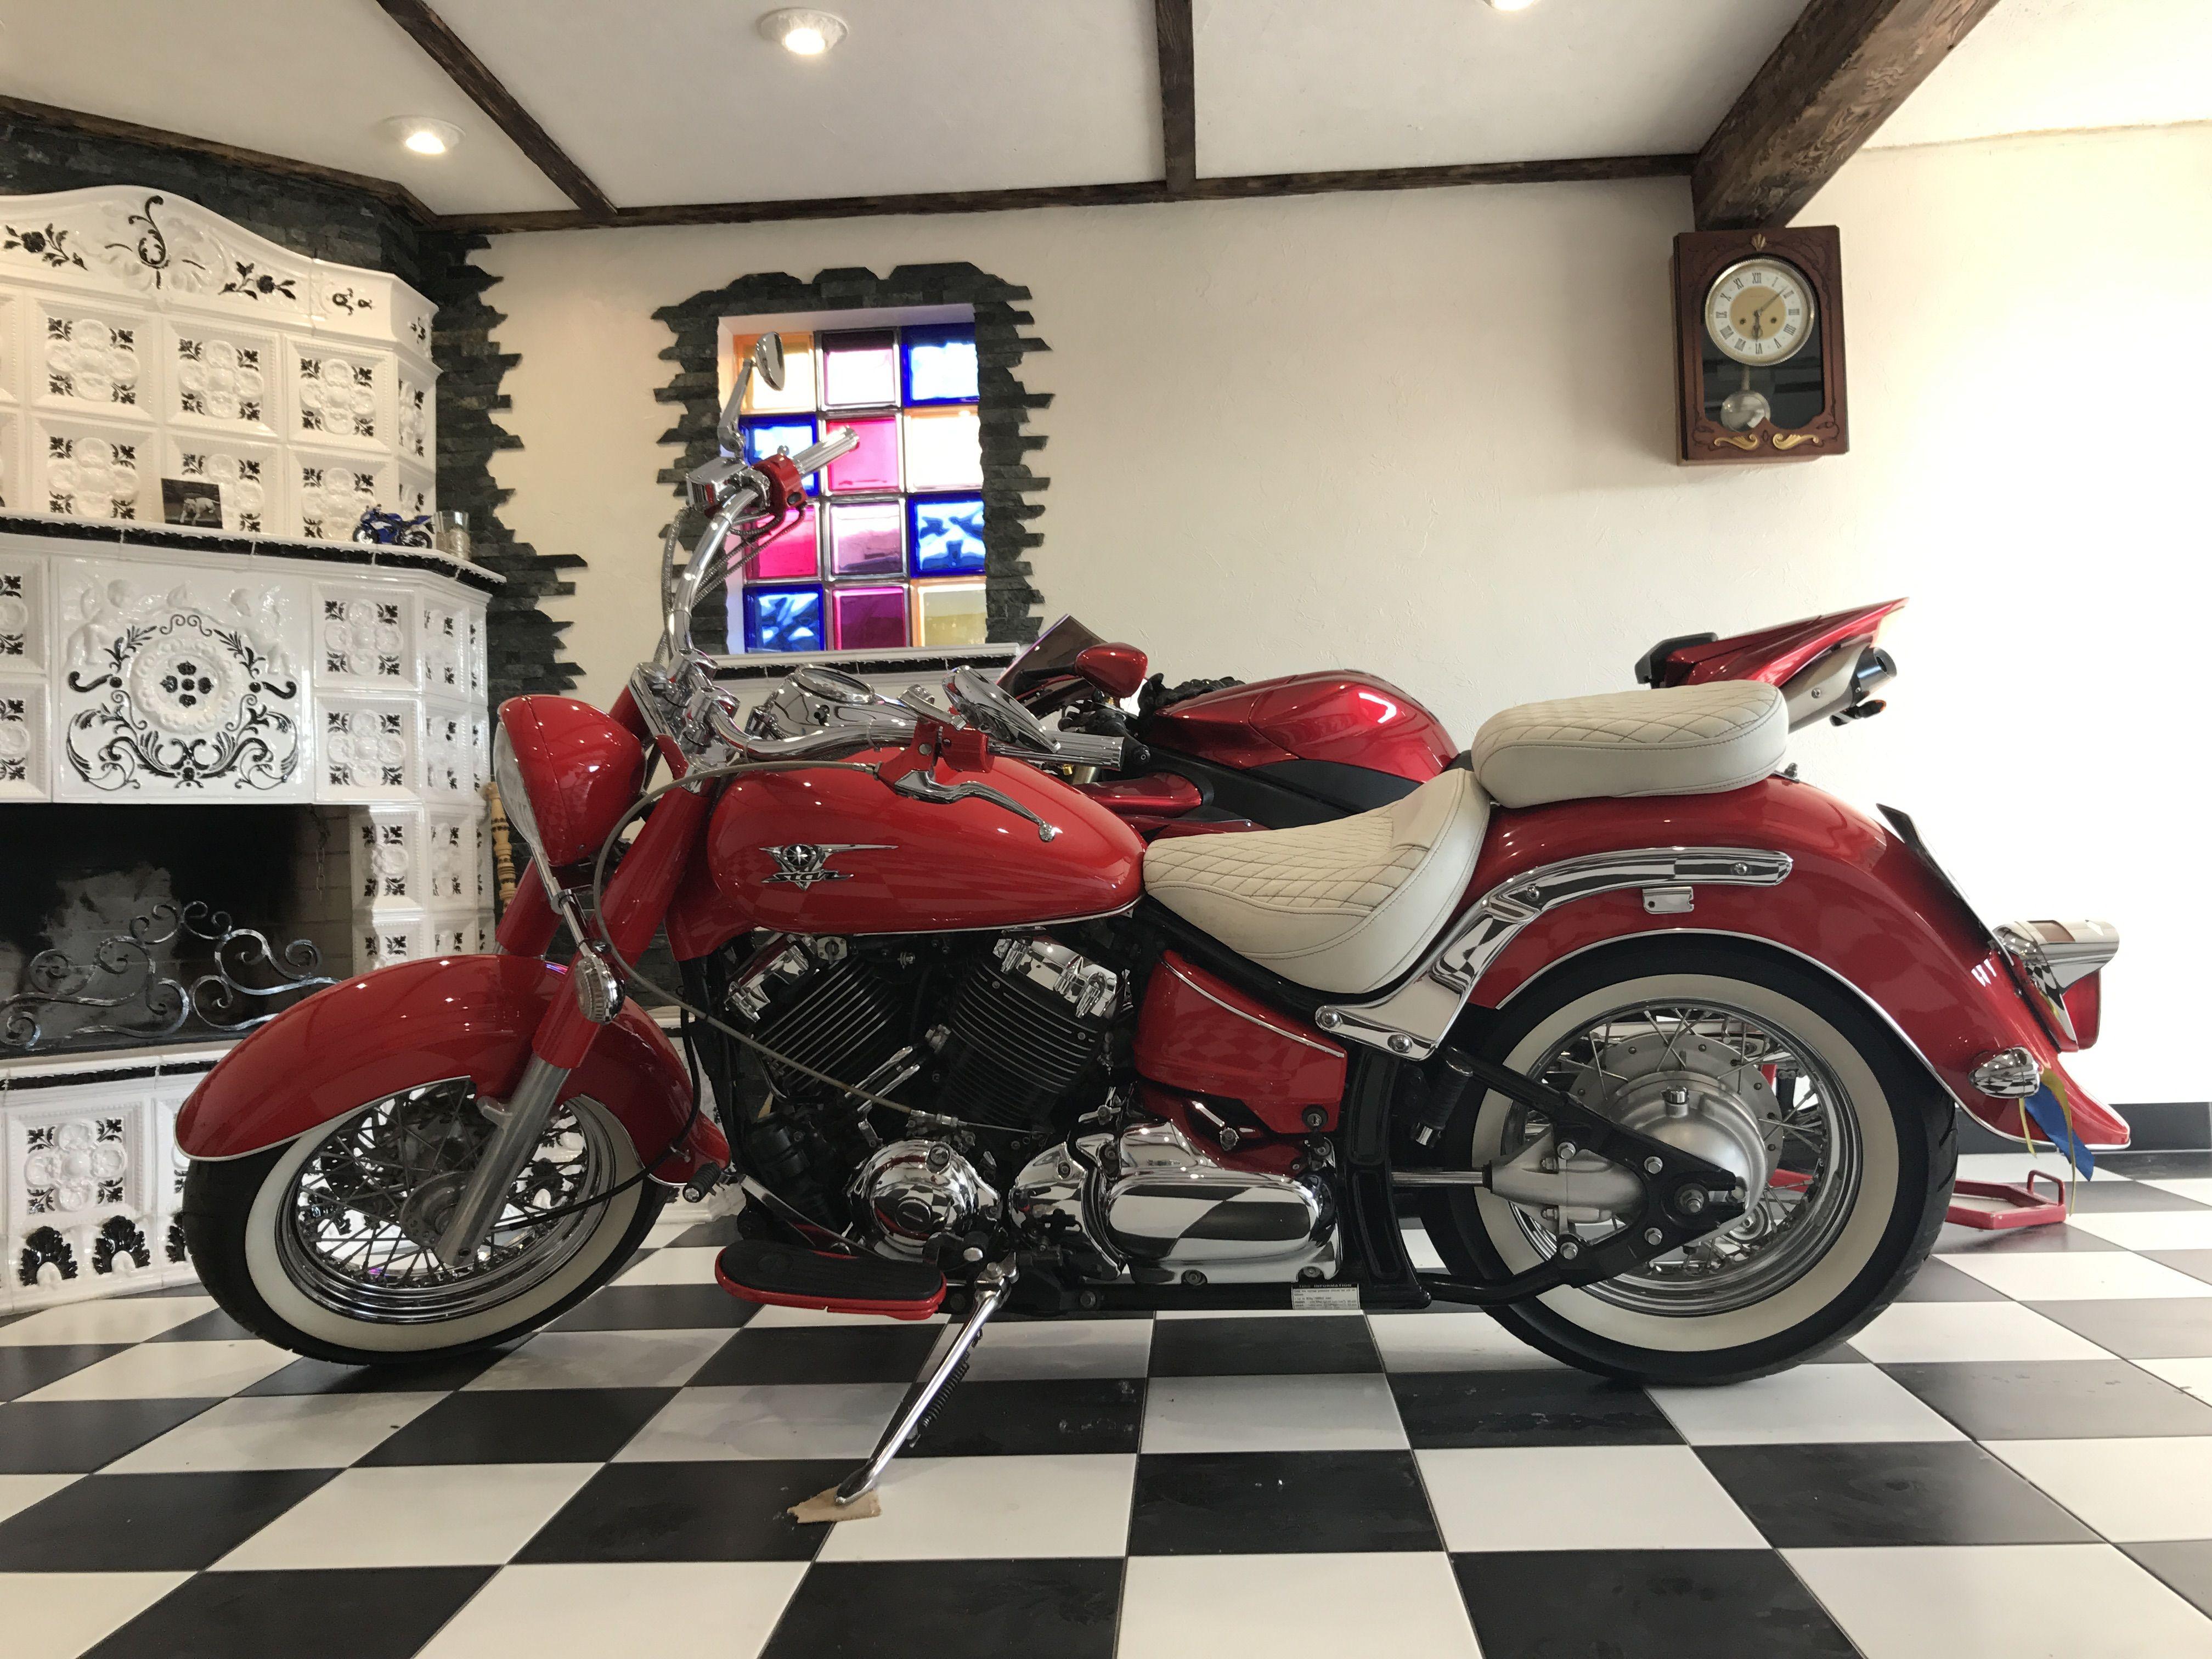 Motorcycle Yamaha Drag Star - choose your dream